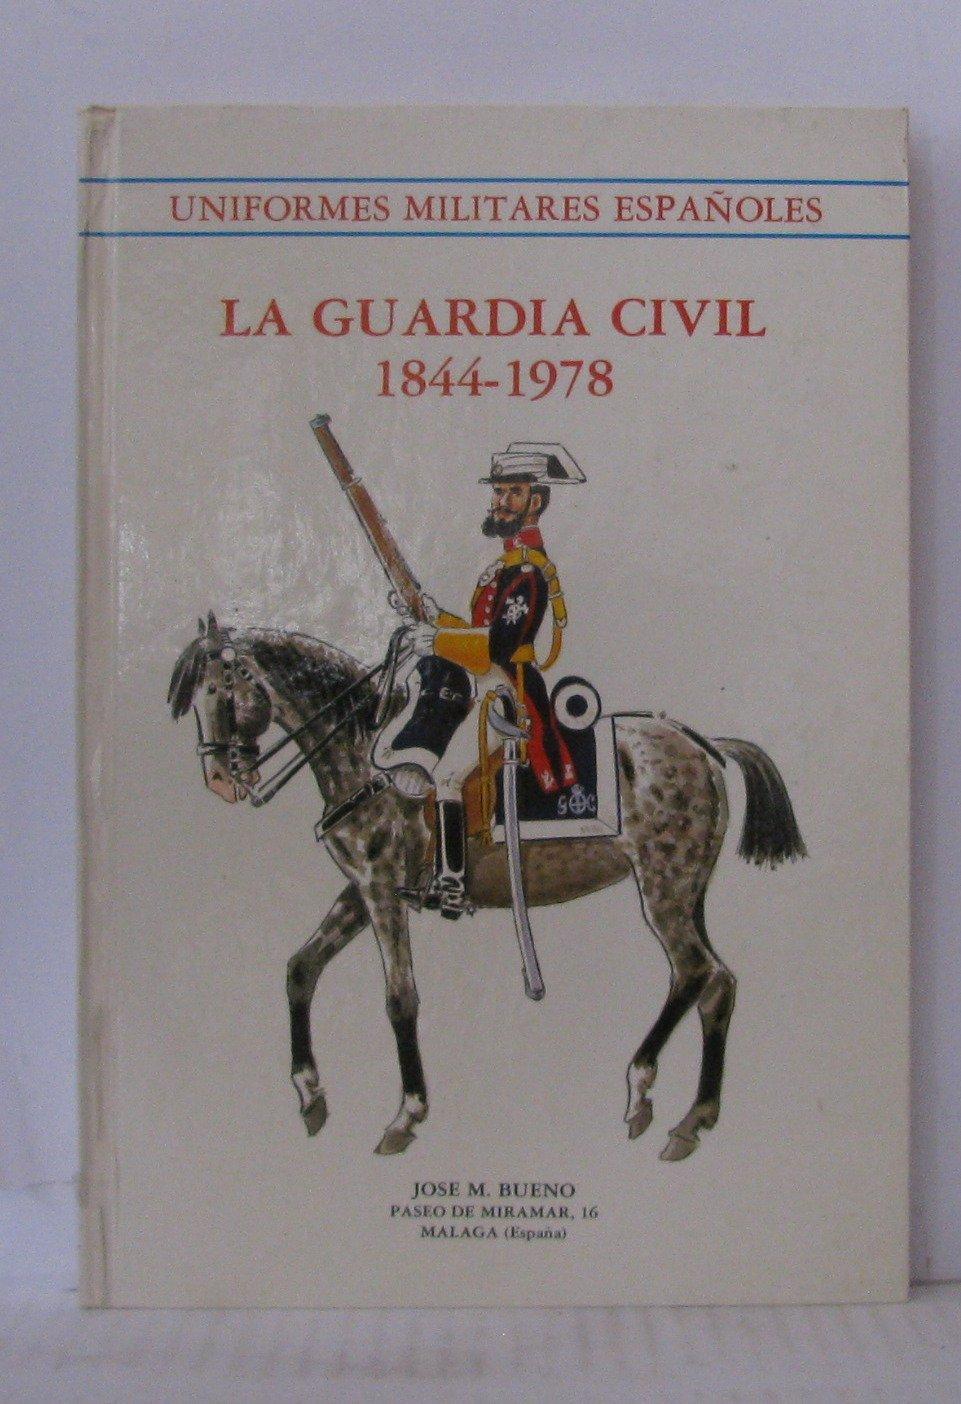 Uniformes militares españoles: La Guardia Civil 1844-1978: Amazon ...